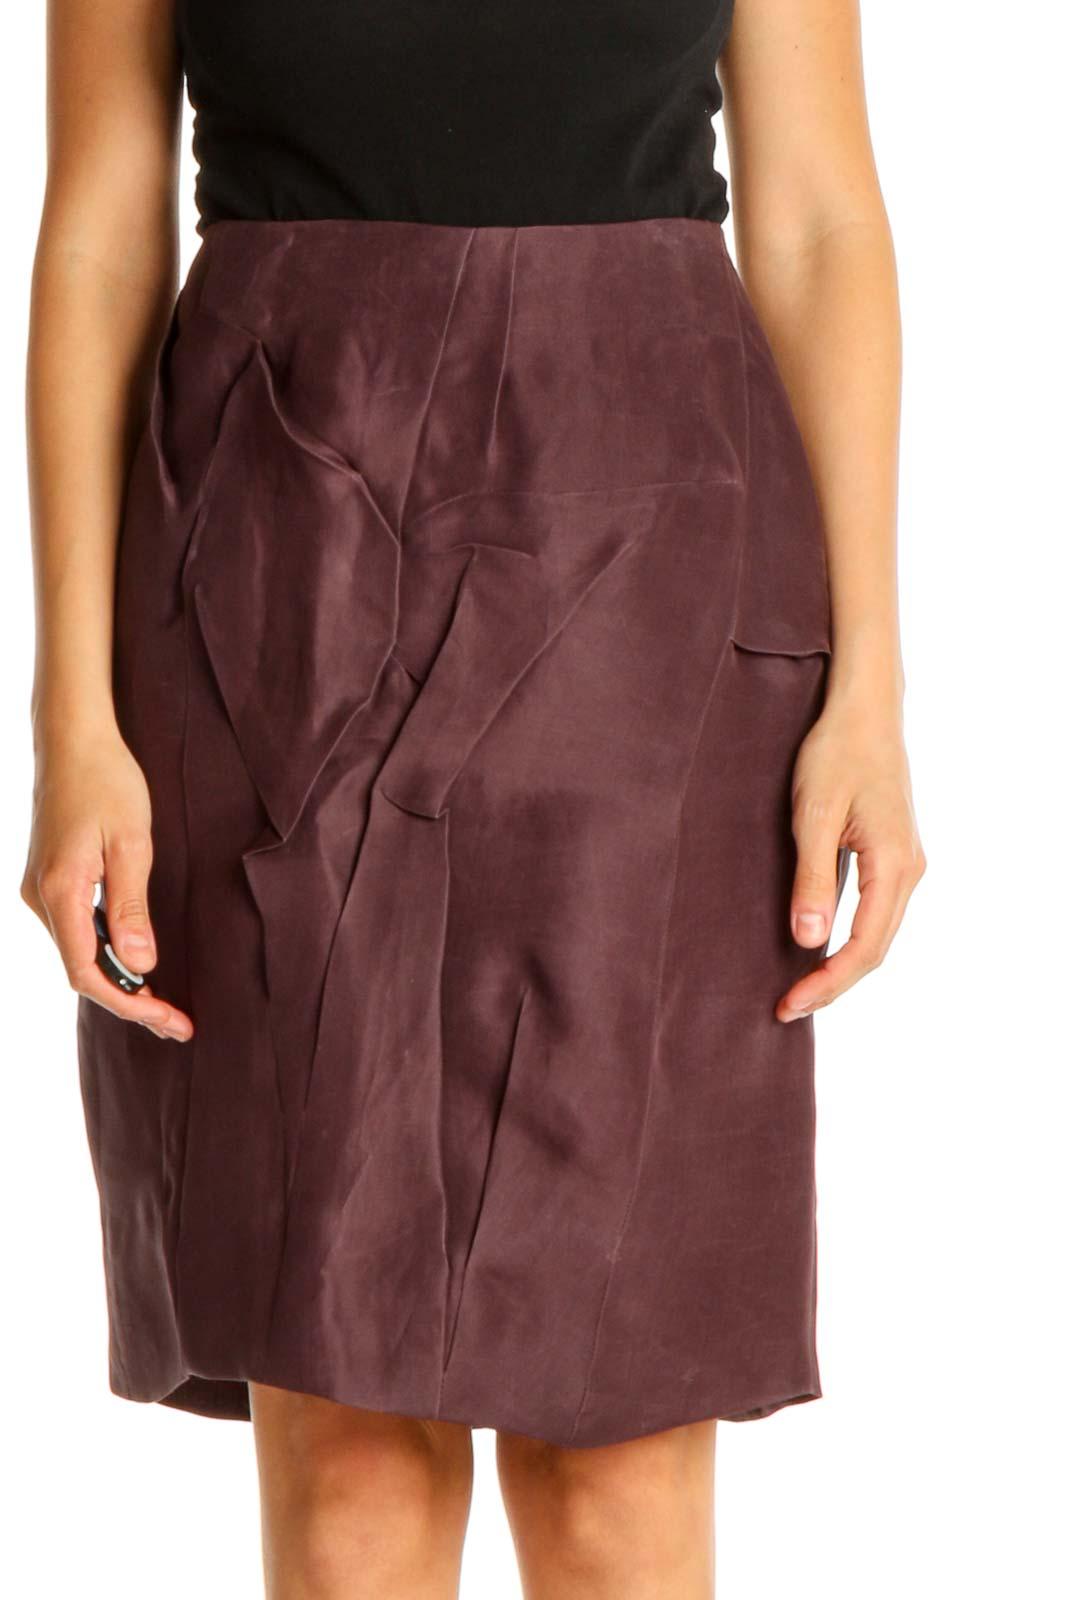 Purple Solid Brunch Pencil Skirt Front